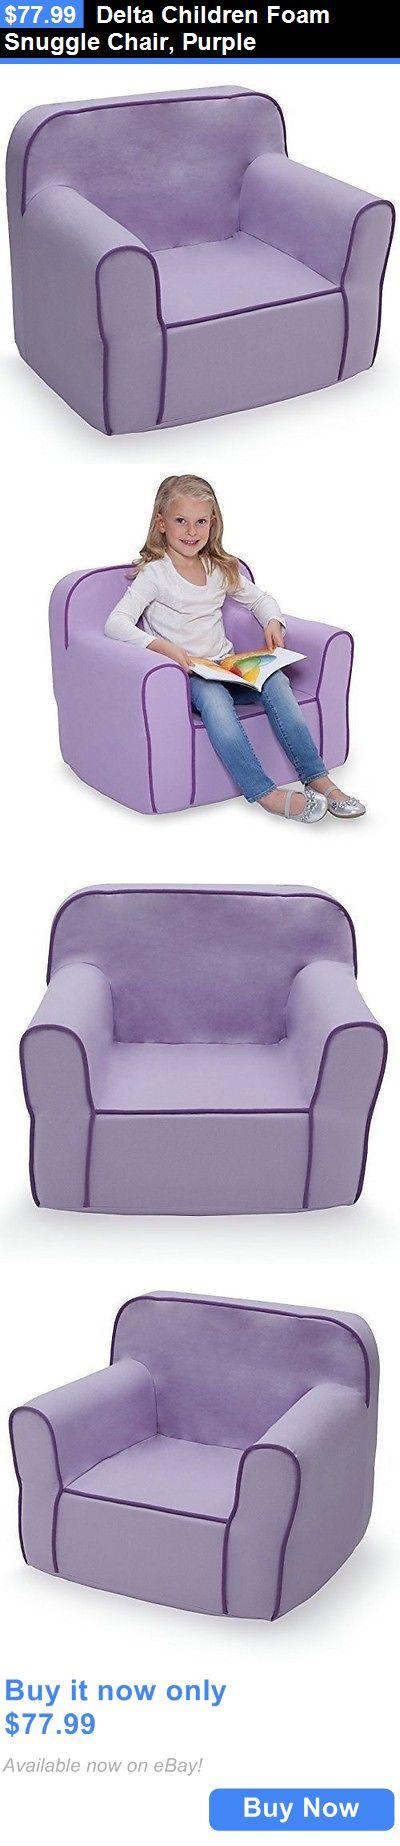 Kids Furniture: Delta Children Foam Snuggle Chair, Purple BUY IT NOW ONLY:  $77.99